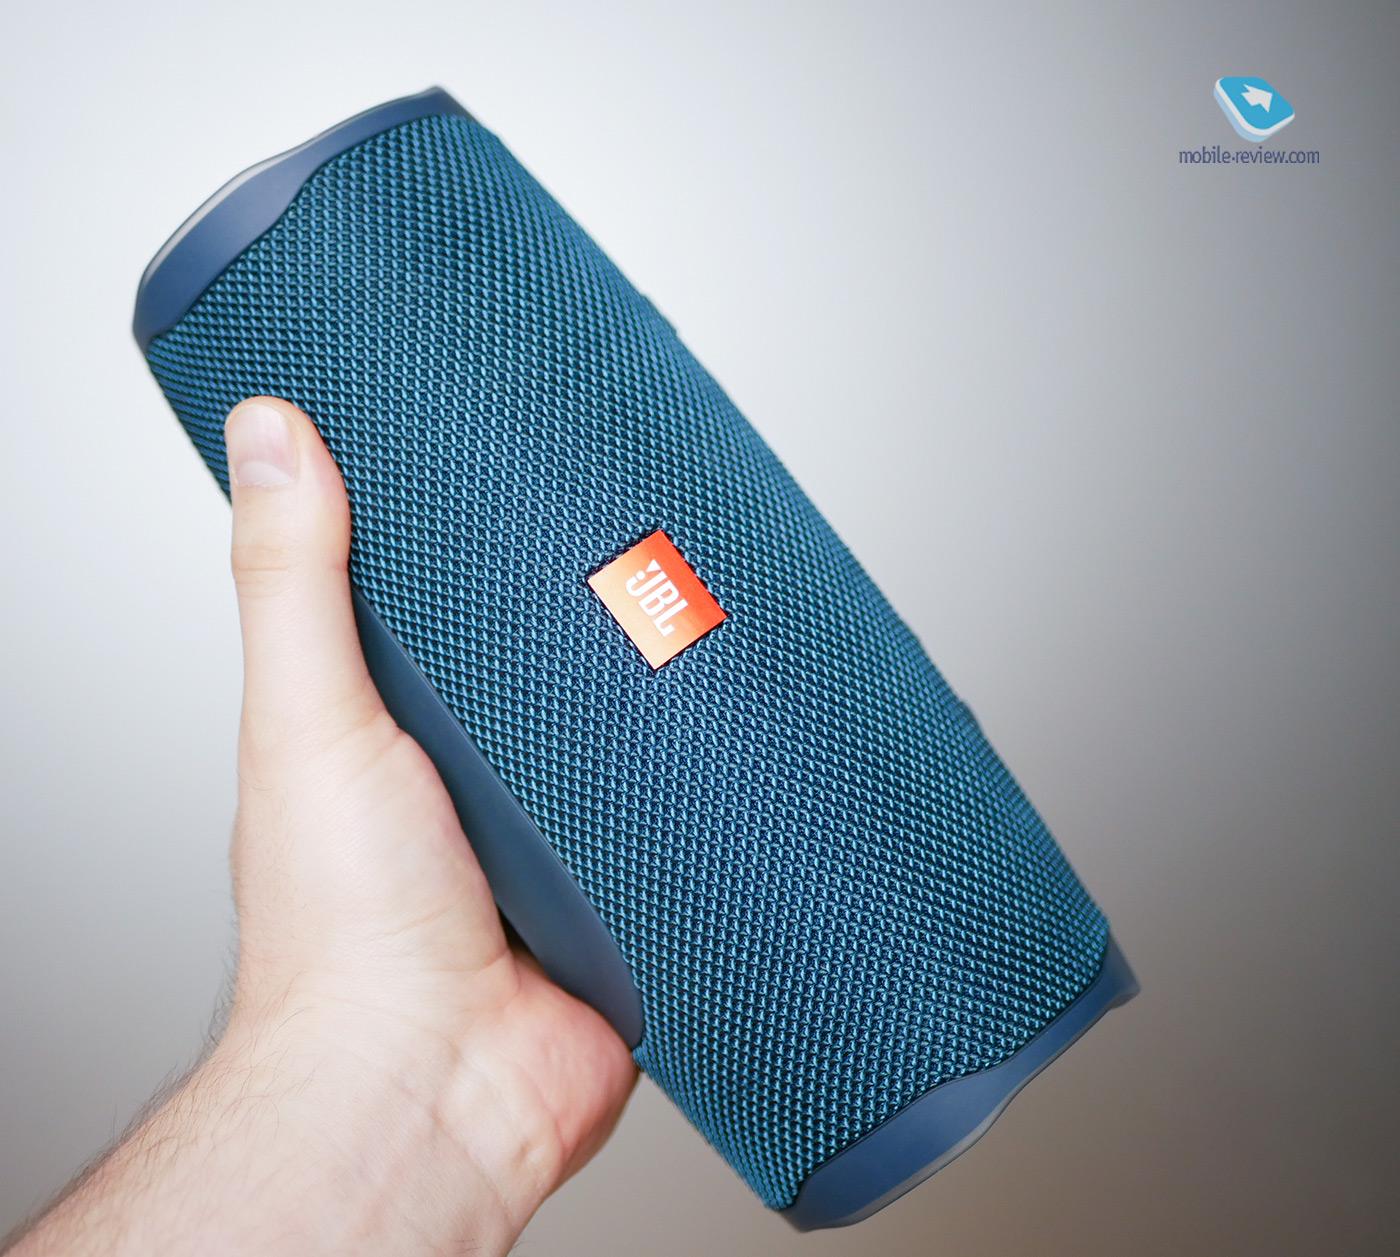 Подборка: JBL Charge 4, Huawei Pocket Photo Printer и аксессуары Ugreen